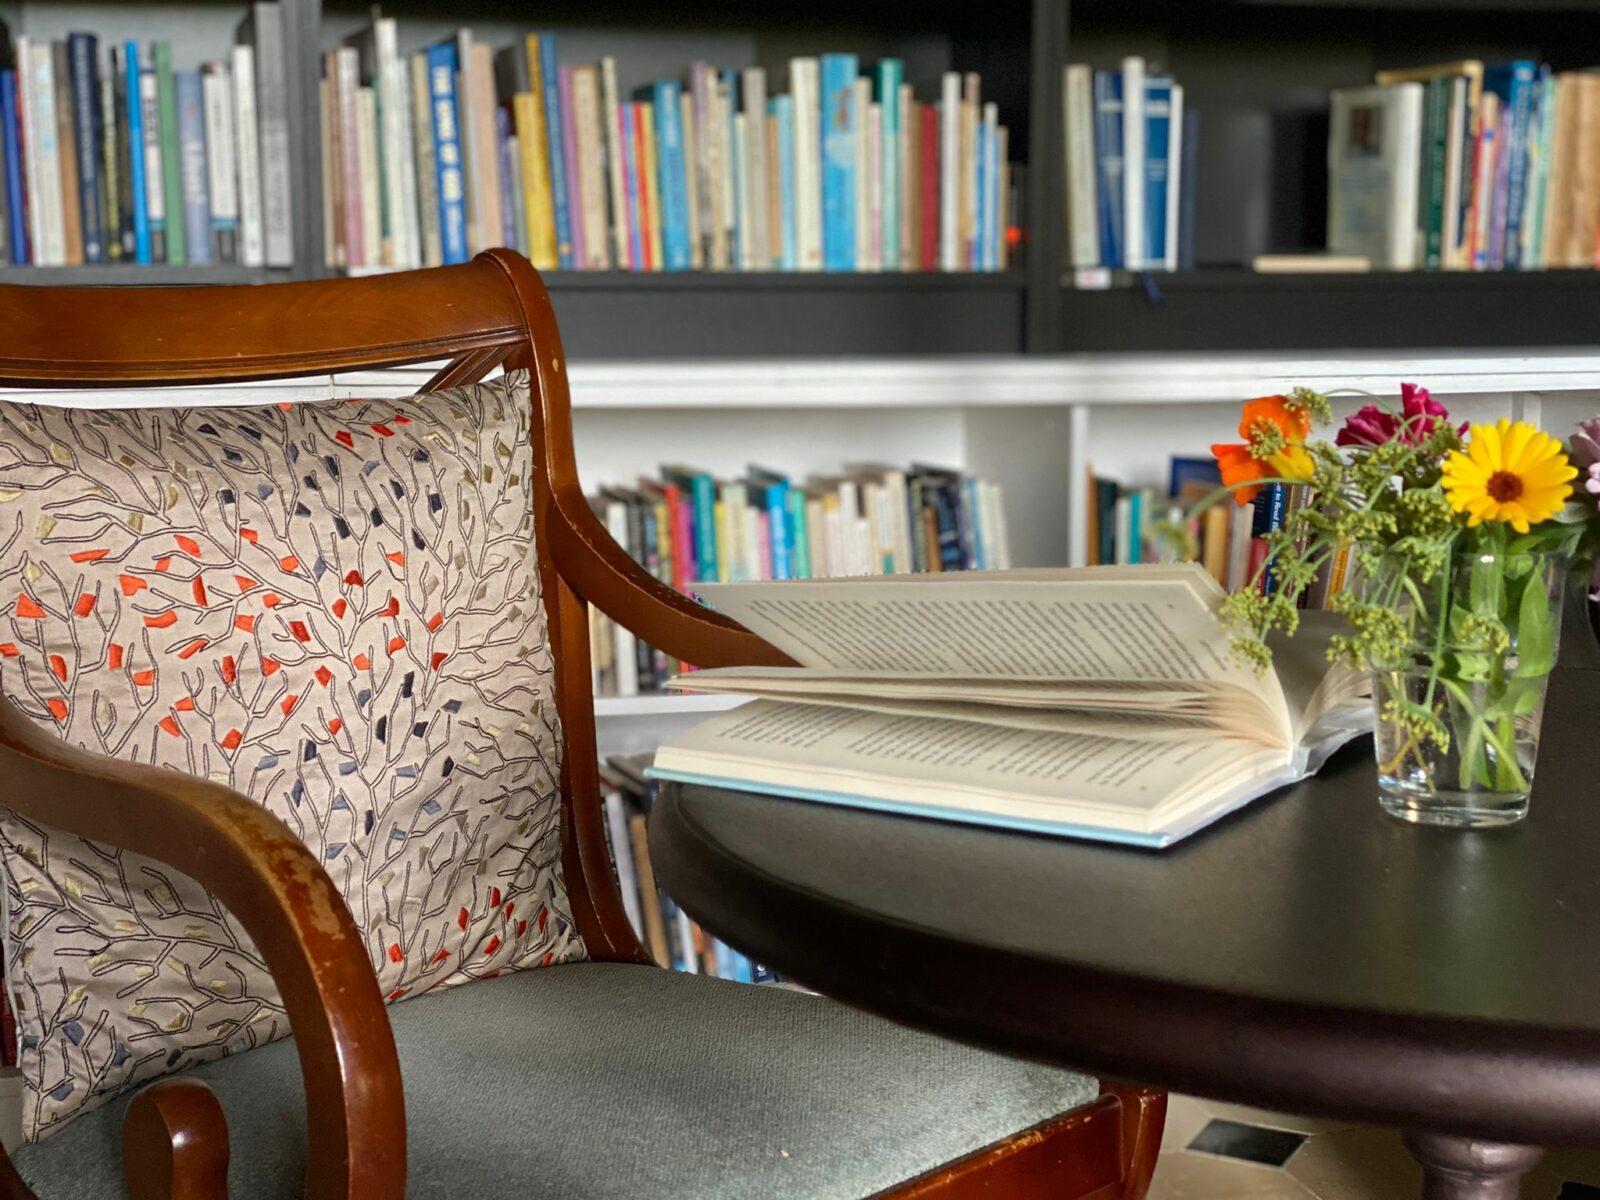 Bonnevaux library